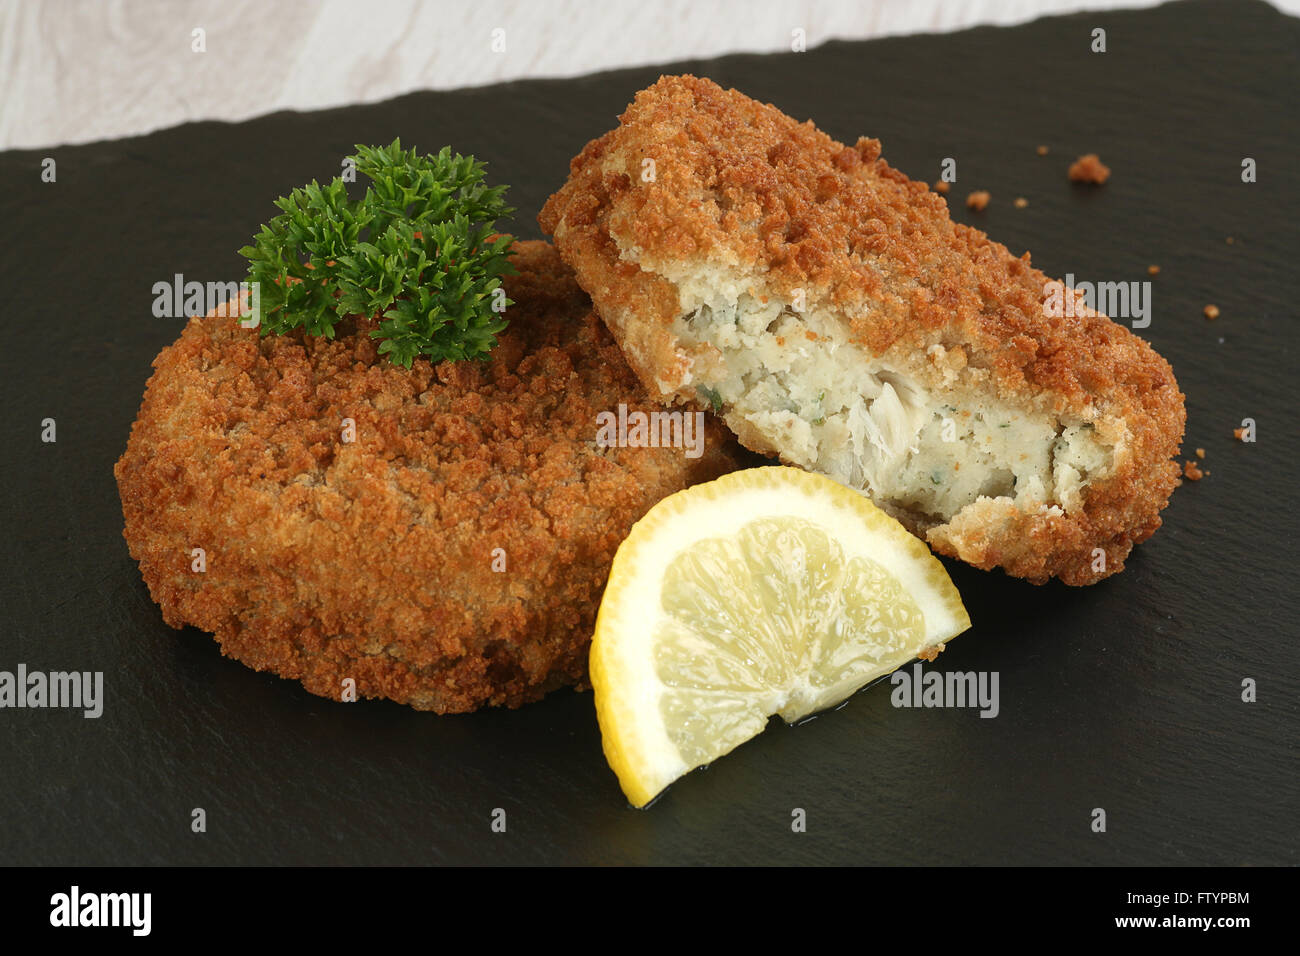 two cod fishcakes with lemon and parsley garnish - Stock Image